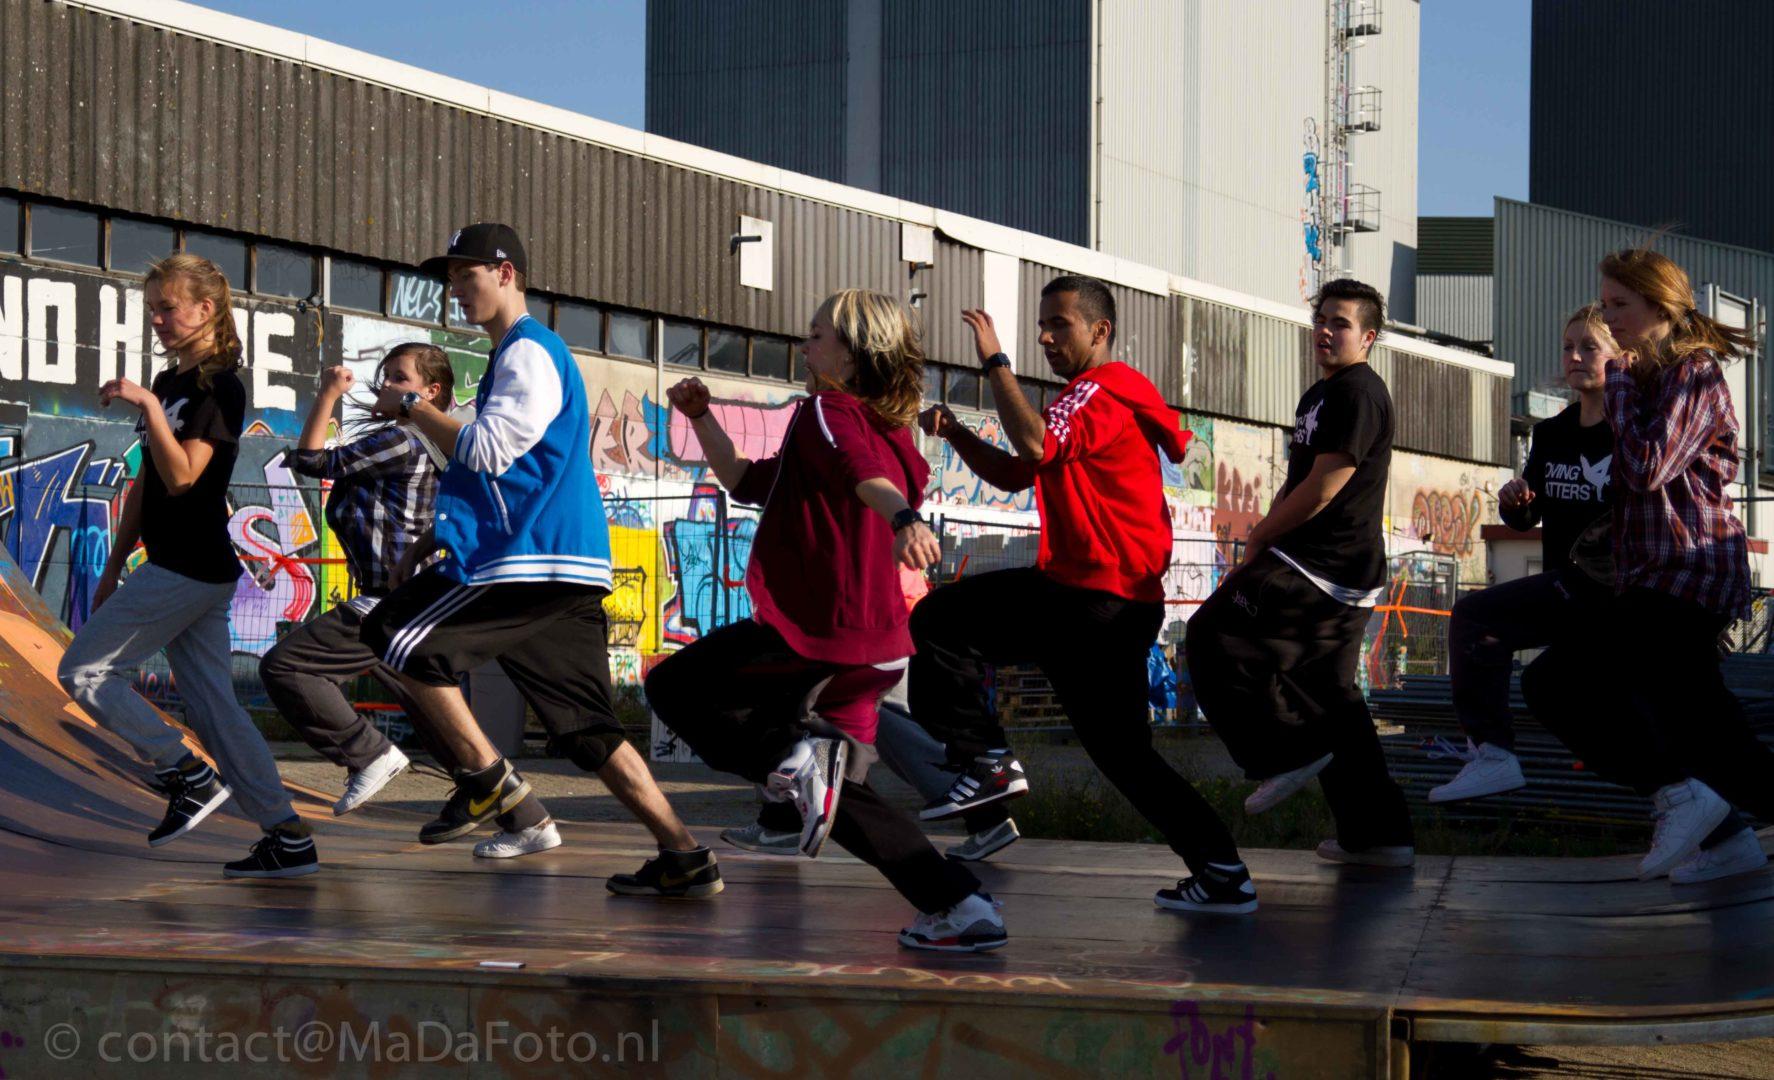 Waalhalla Hip Hop honigcomplex skatehal dicht bij snelbinder